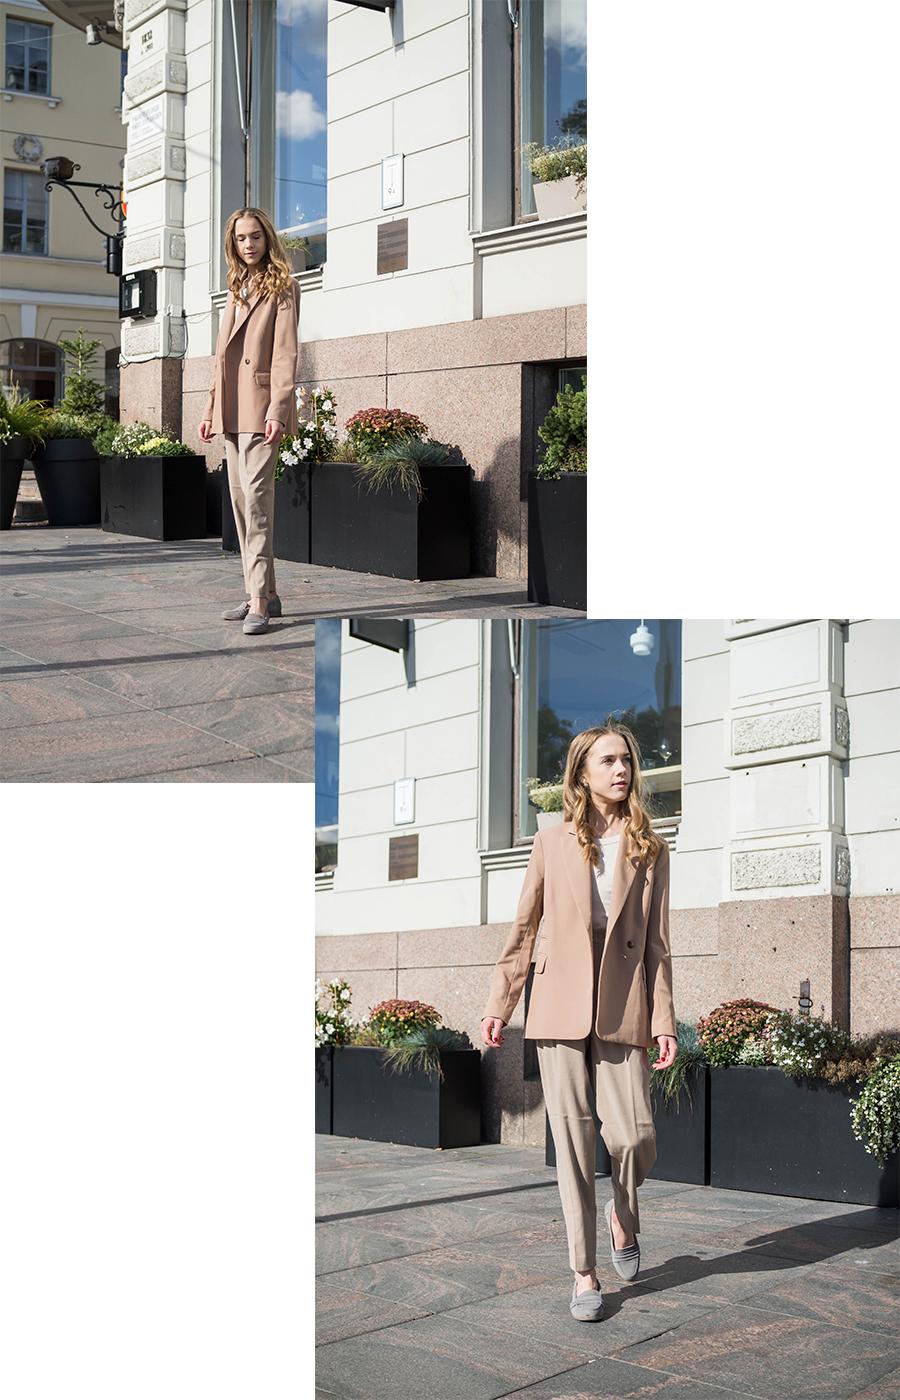 Kuinka pukeutua kokonaan beigeen - How to wear all beige outfits